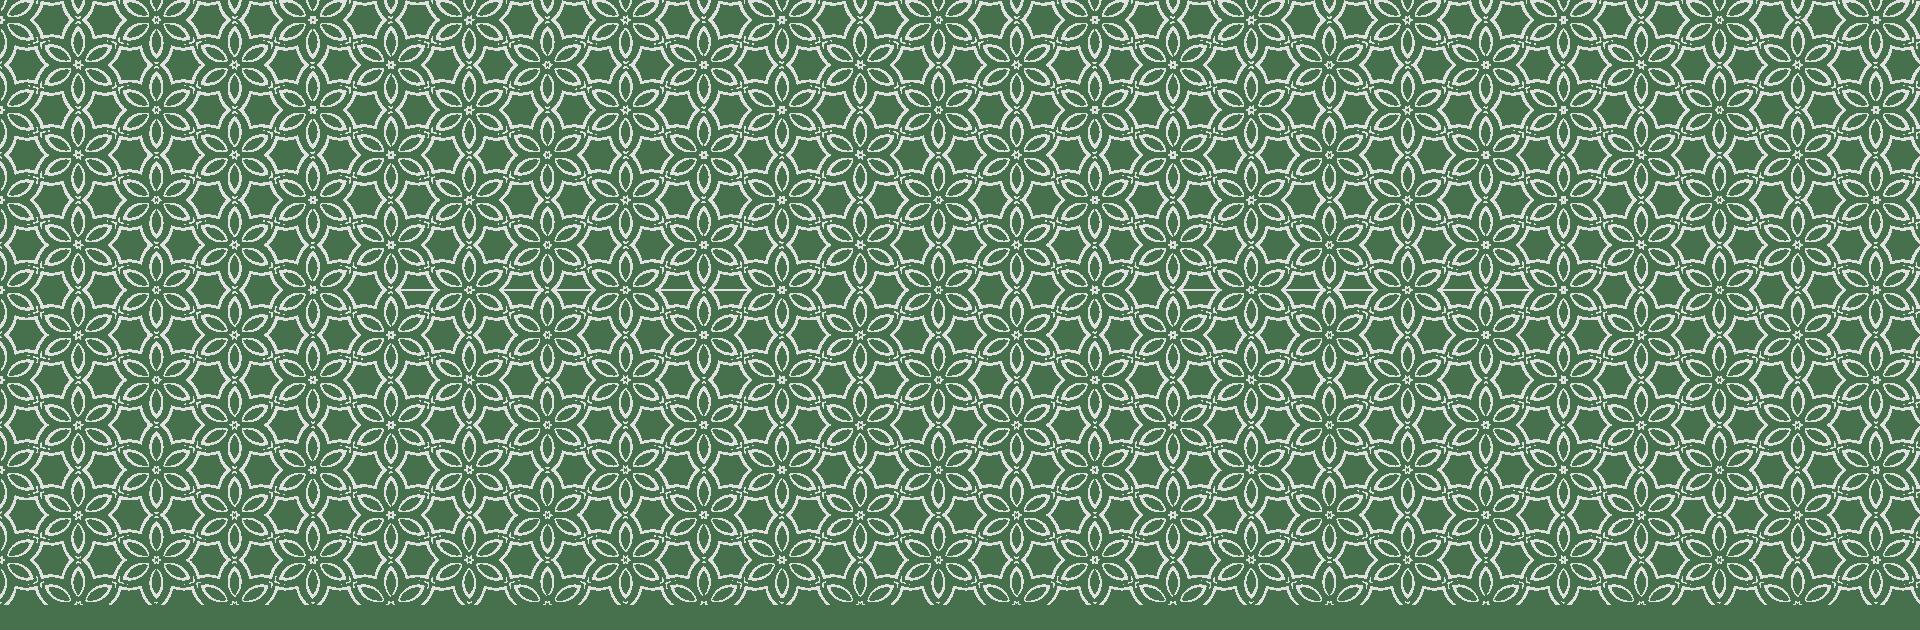 bckg-pattern